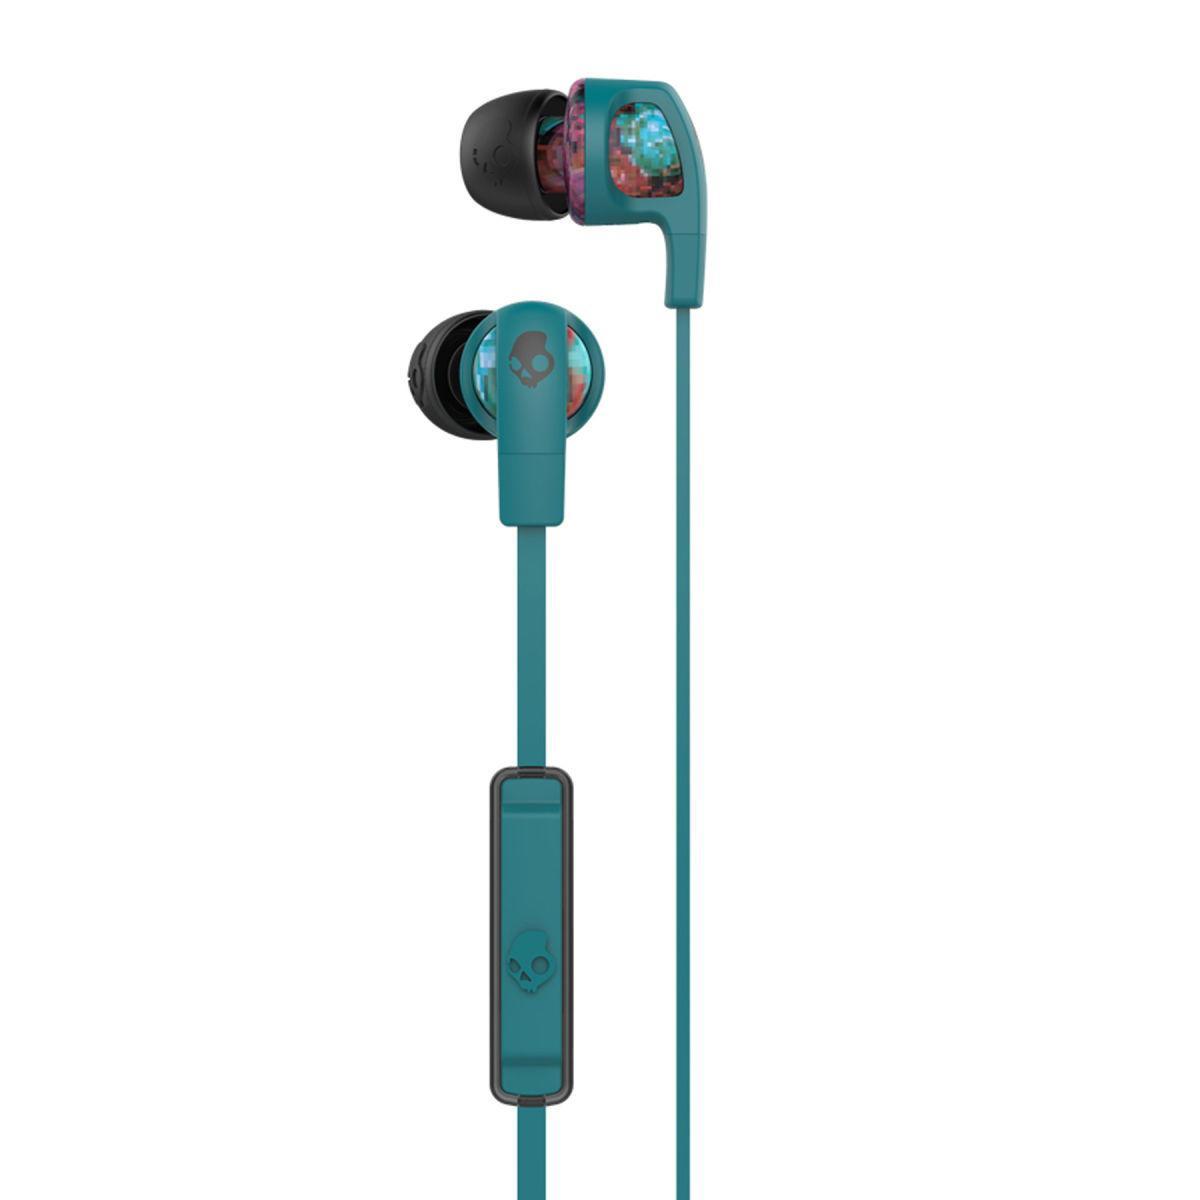 Skullcandy Headphones Speakers Online In Pakistan Army Handsfree Earphone Iron Bass 2 Biru S2pggy 364 Smokin Buds With Mic Granny Floral